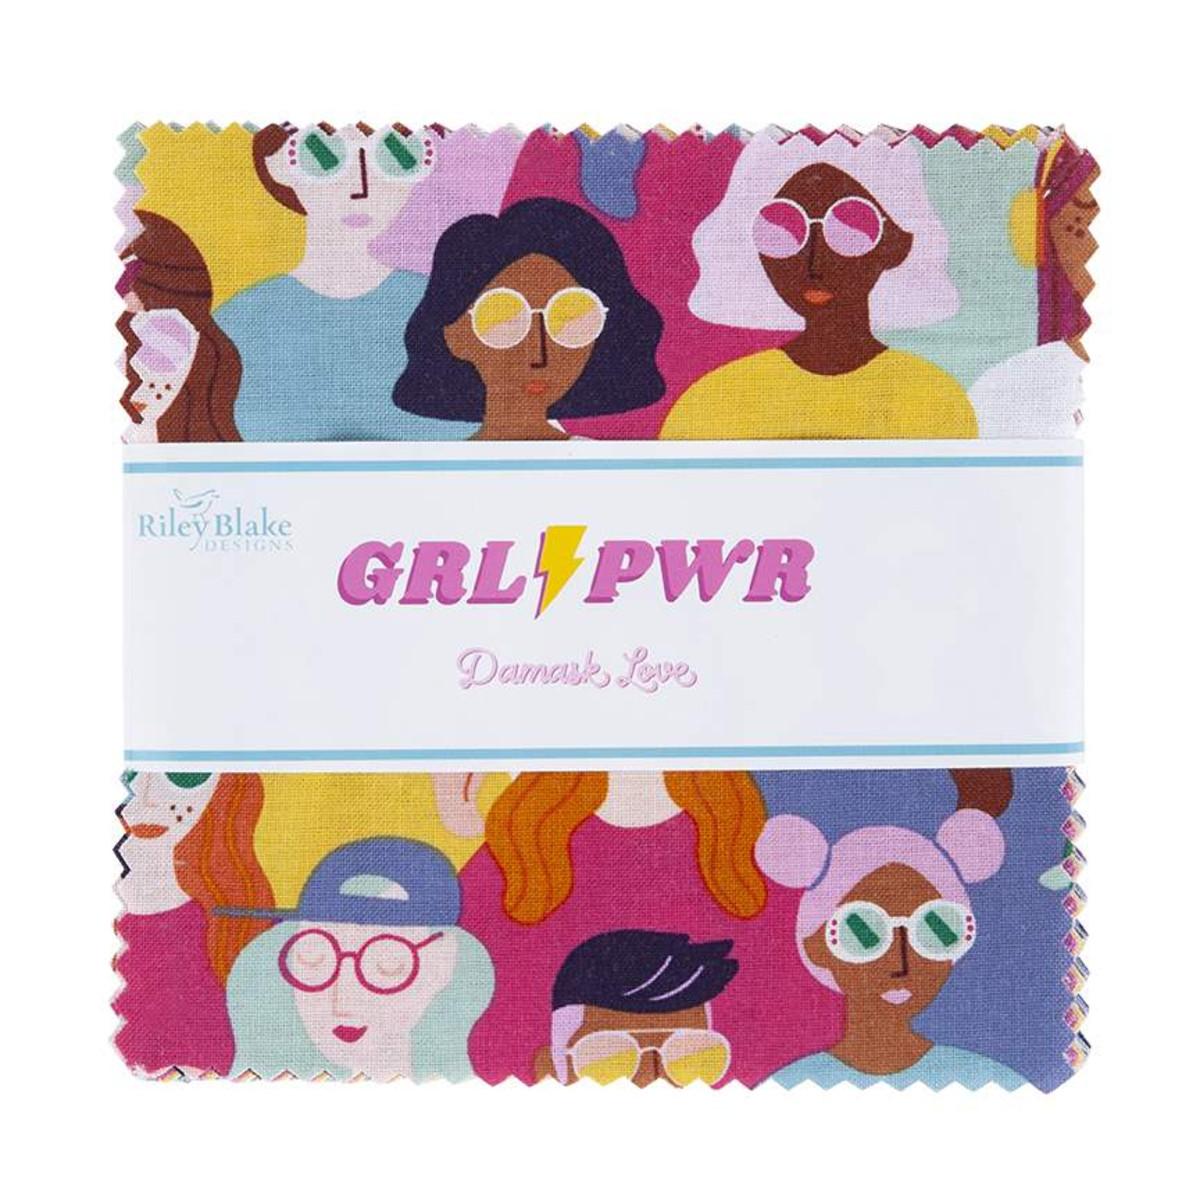 Riley Blake Charm Pack - Girl Power